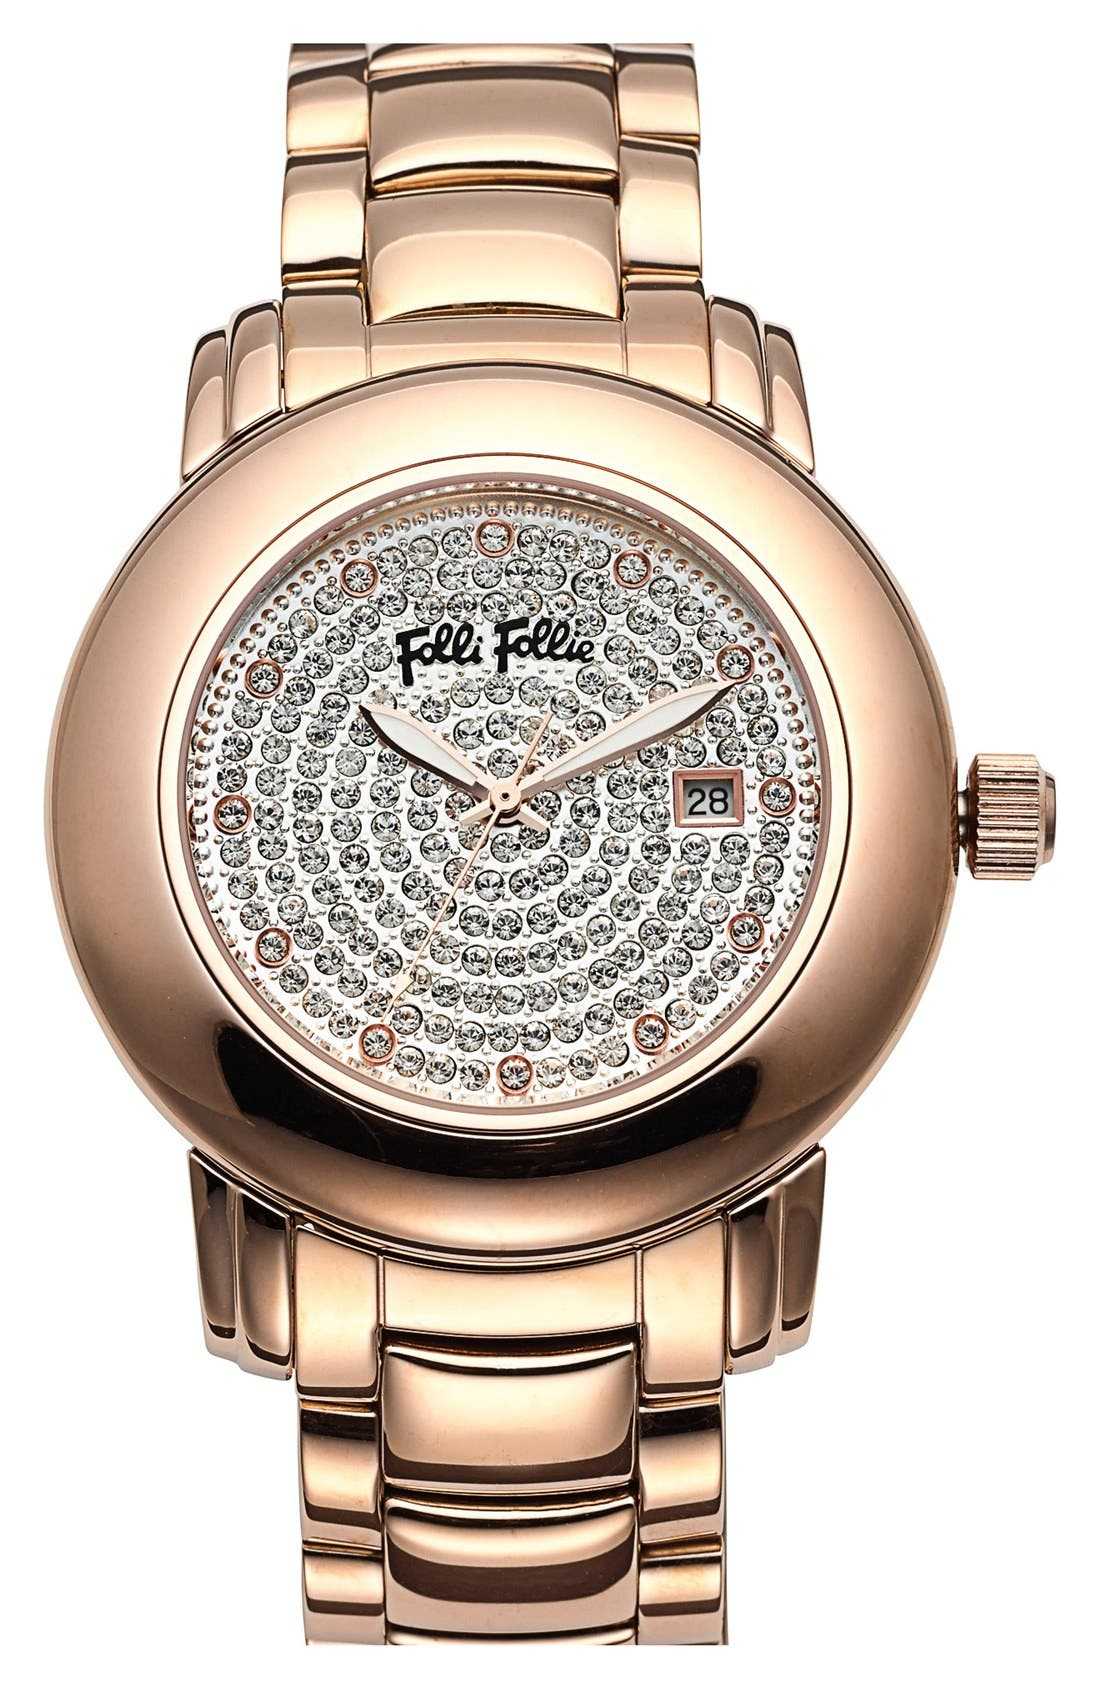 Alternate Image 1 Selected - Folli Follie 'Urban Spin' Crystal Dial Bracelet Watch, 43mm